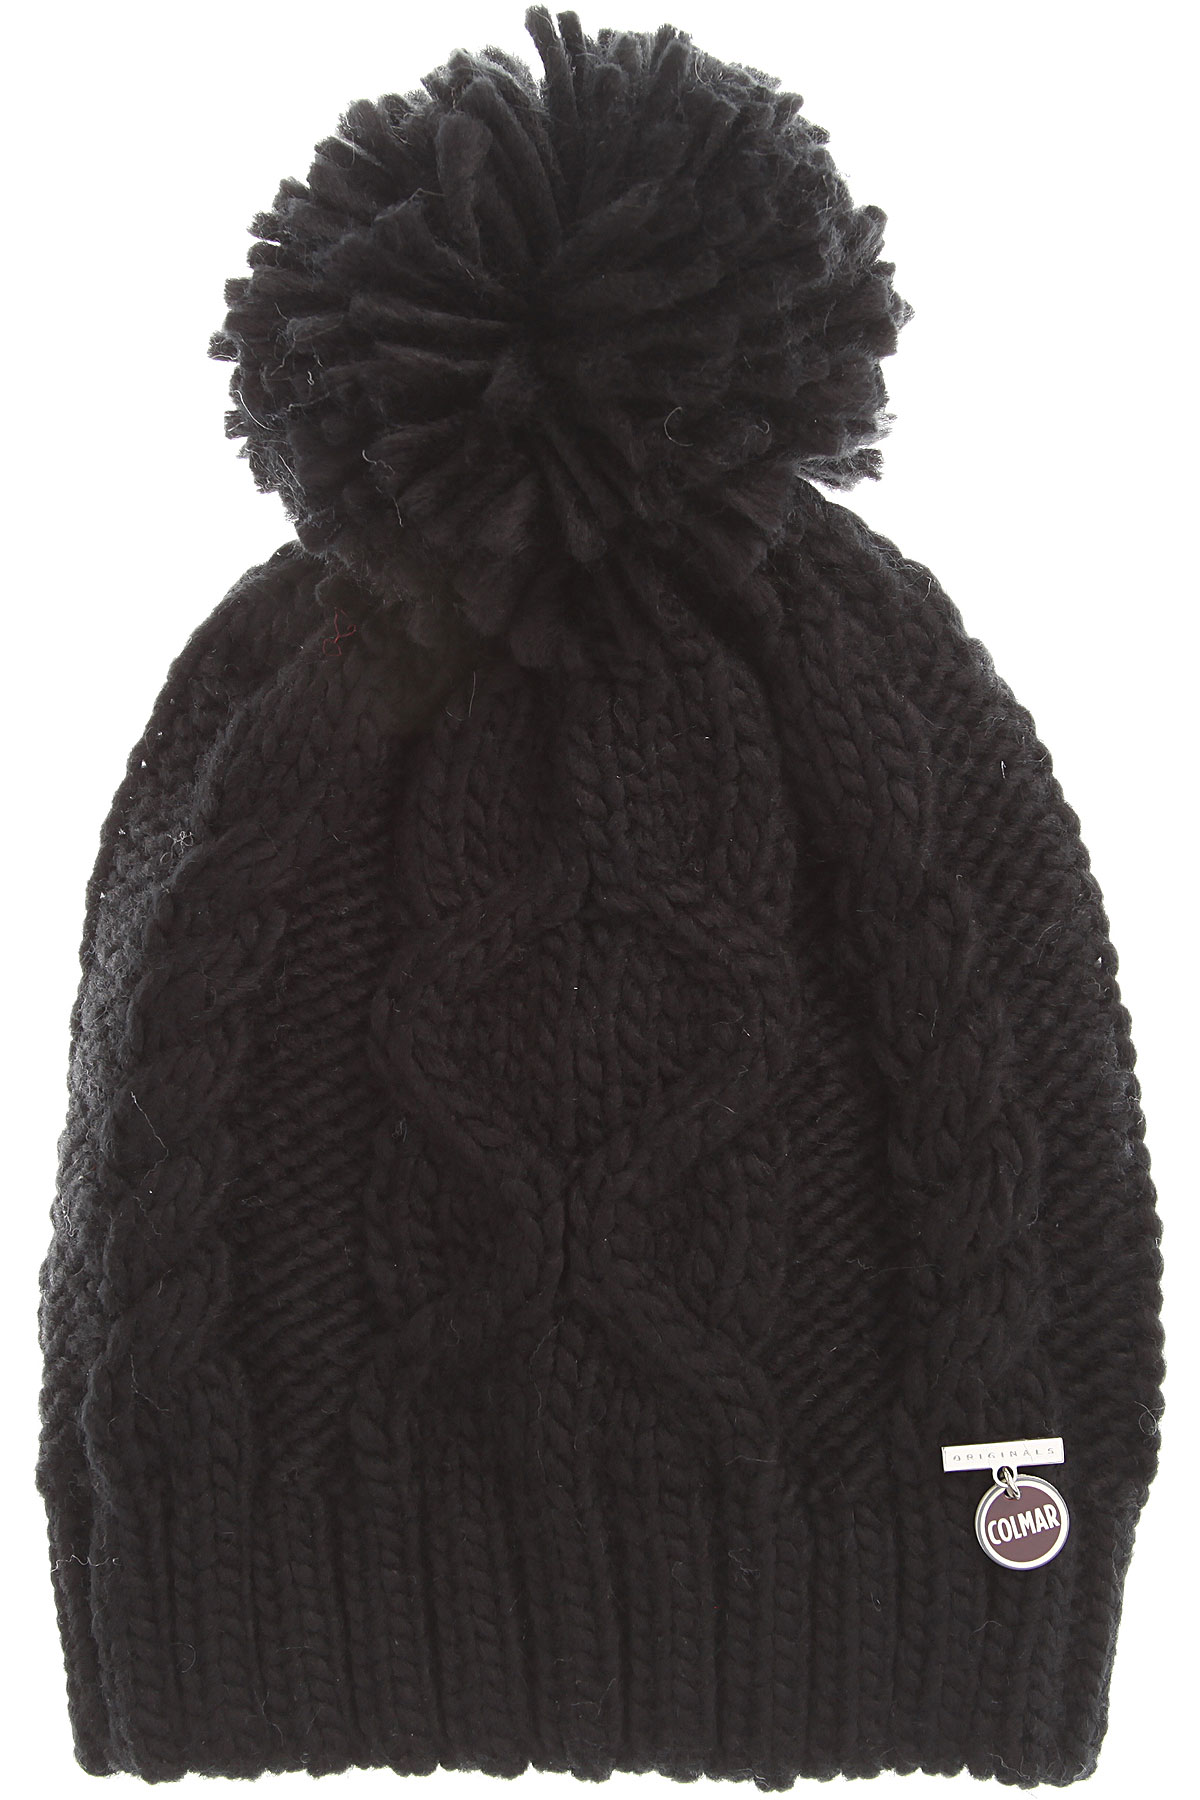 Image of Colmar Hat for Women, Black, Acrylic, 2017